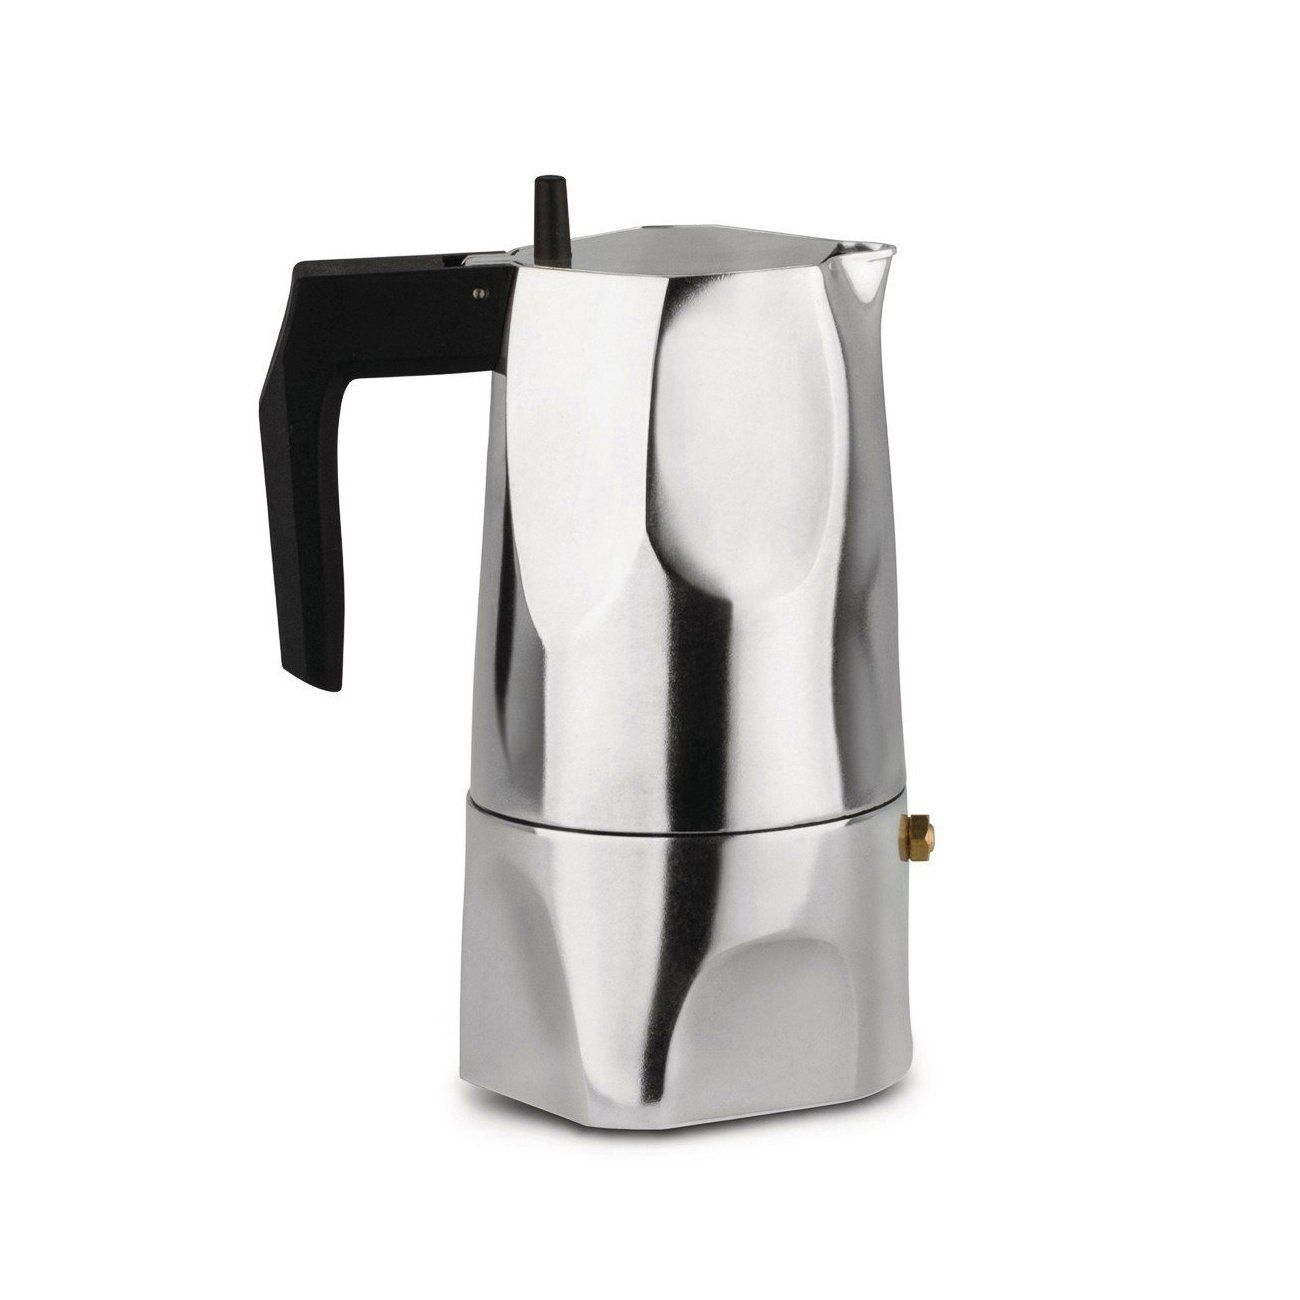 Ossidiana Espresso Coffee Maker